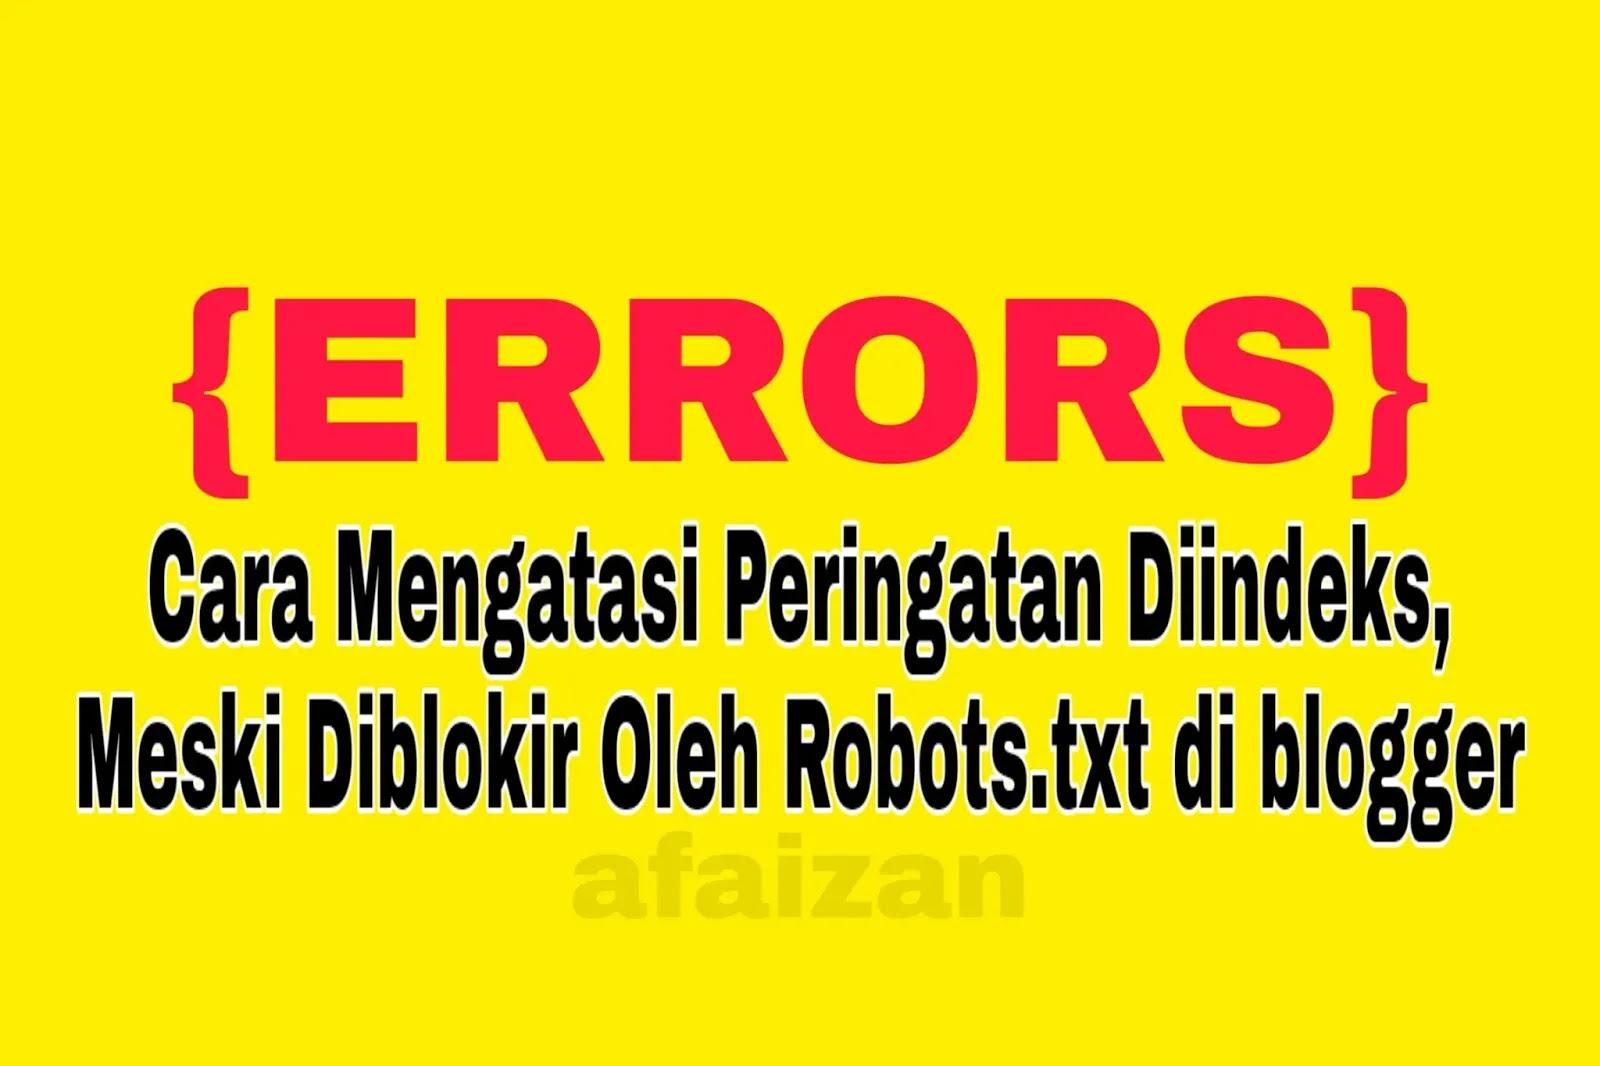 Cara Mengatasi Peringatan Diindeks, Meski Diblokir Oleh Robots.txt di blogger